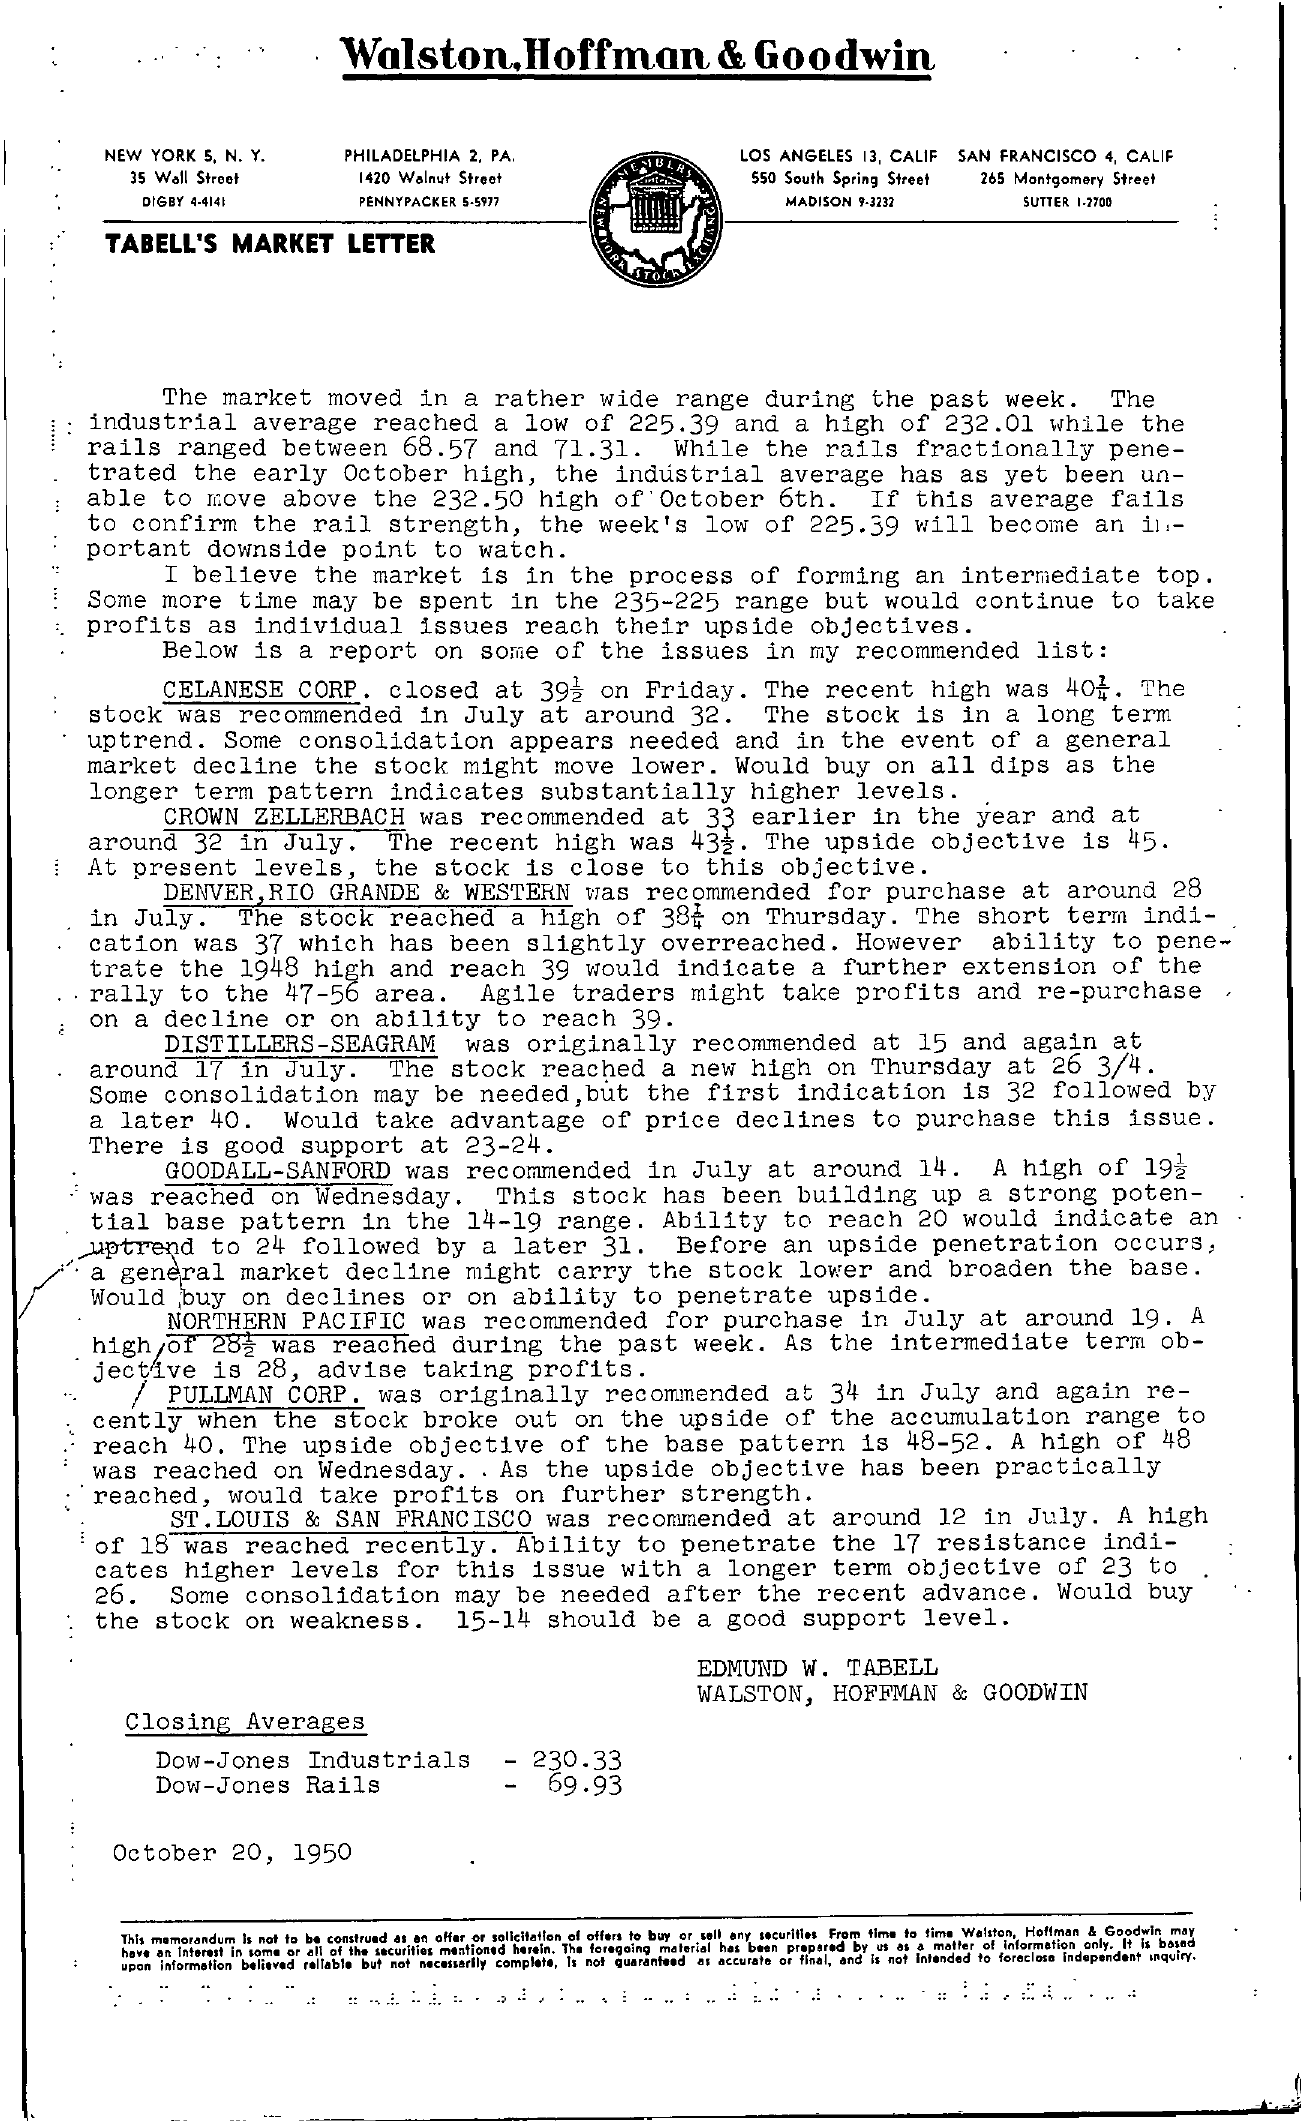 Tabell's Market Letter - October 20, 1950